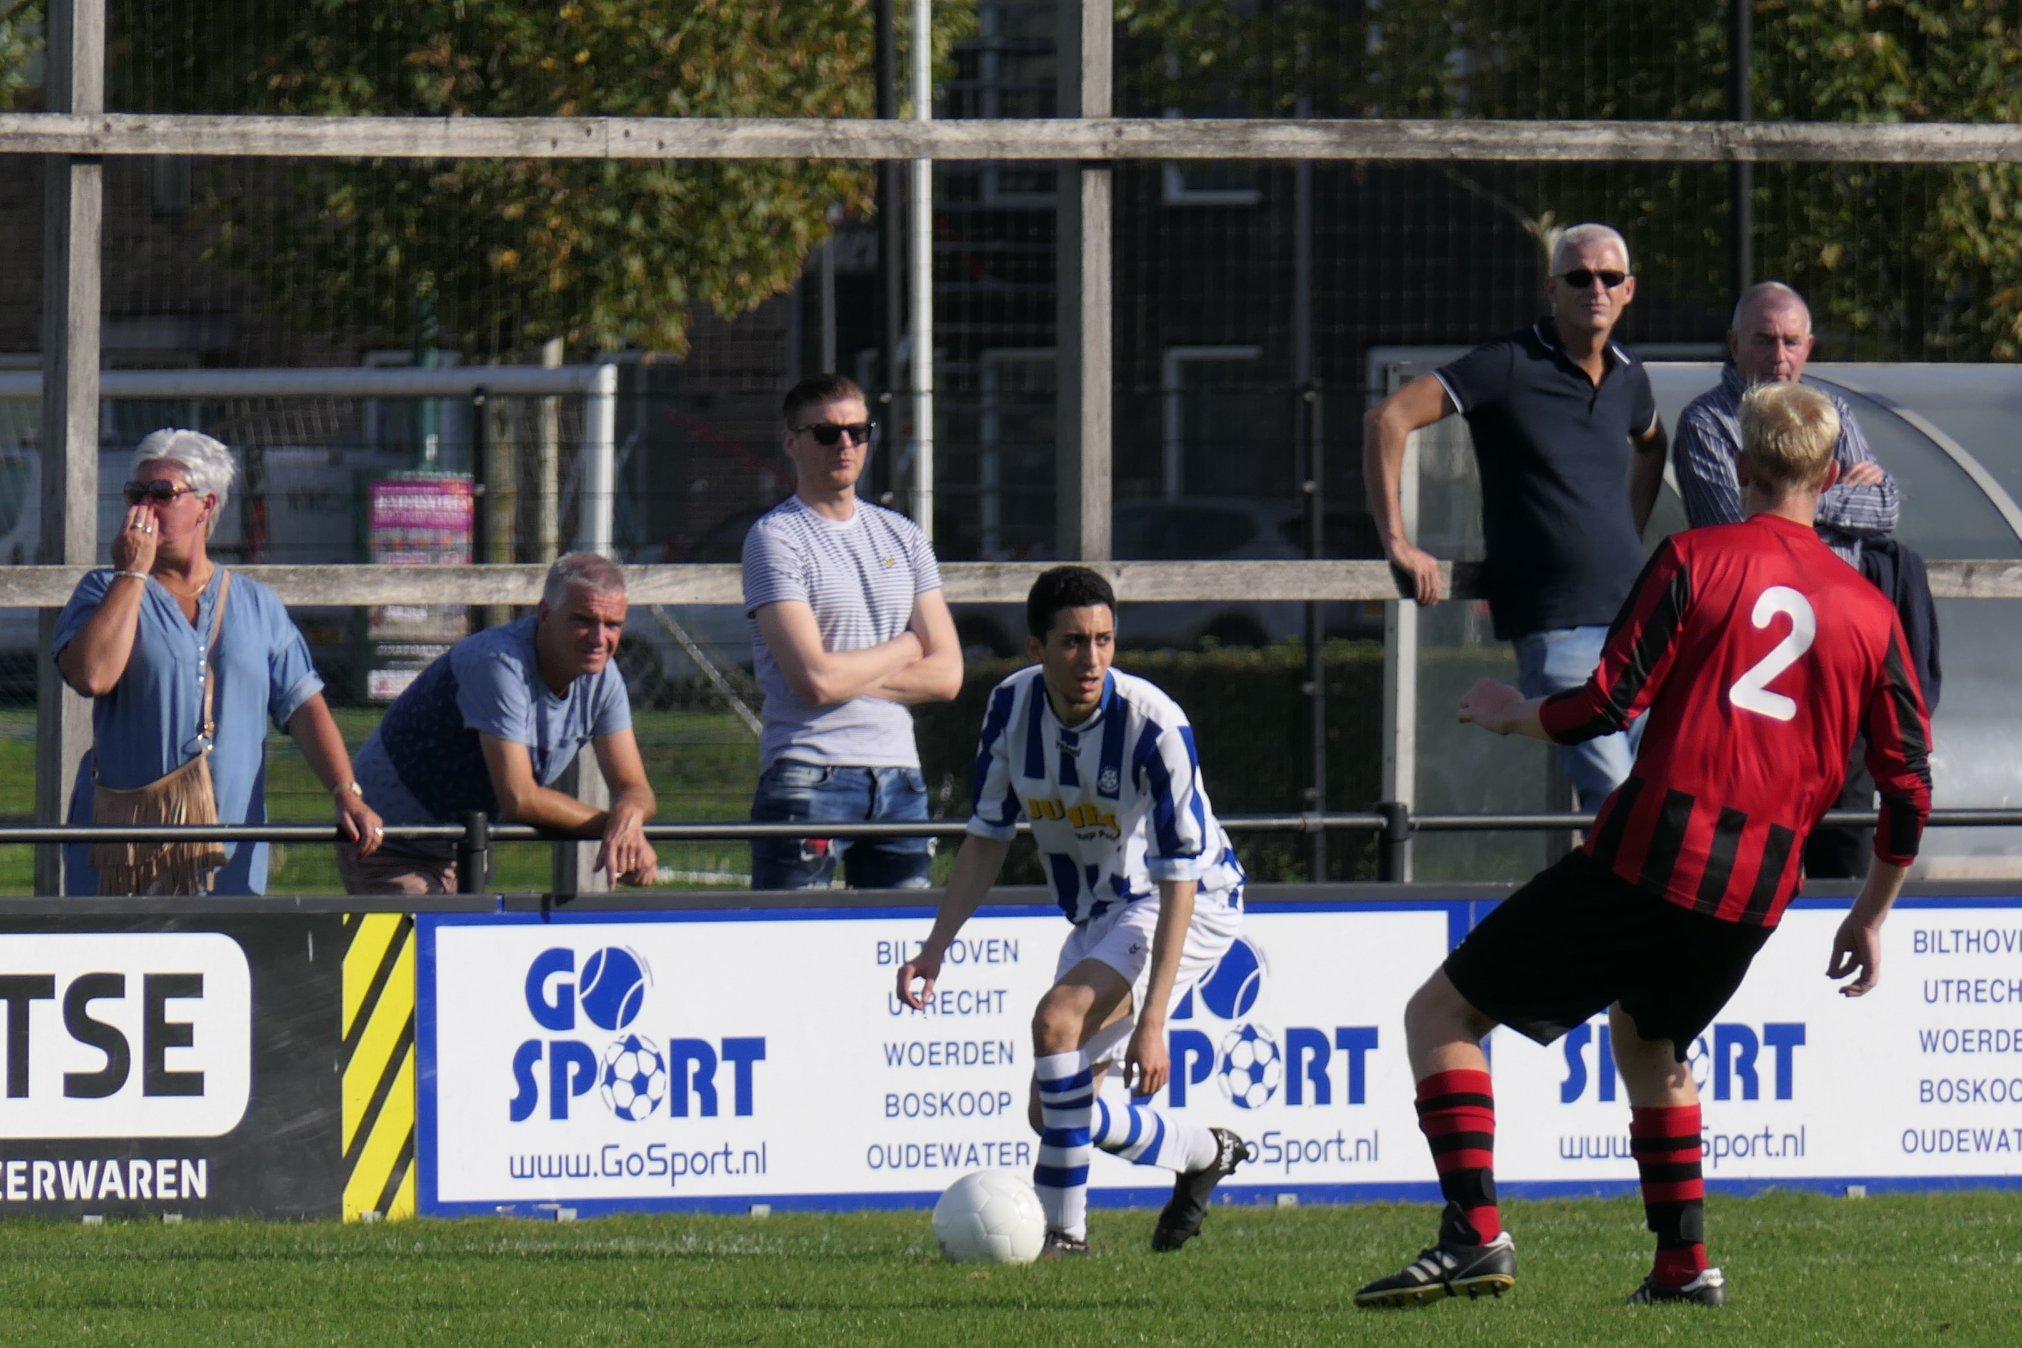 anass-bouharab-SC Woerden, Jolanda Wouters